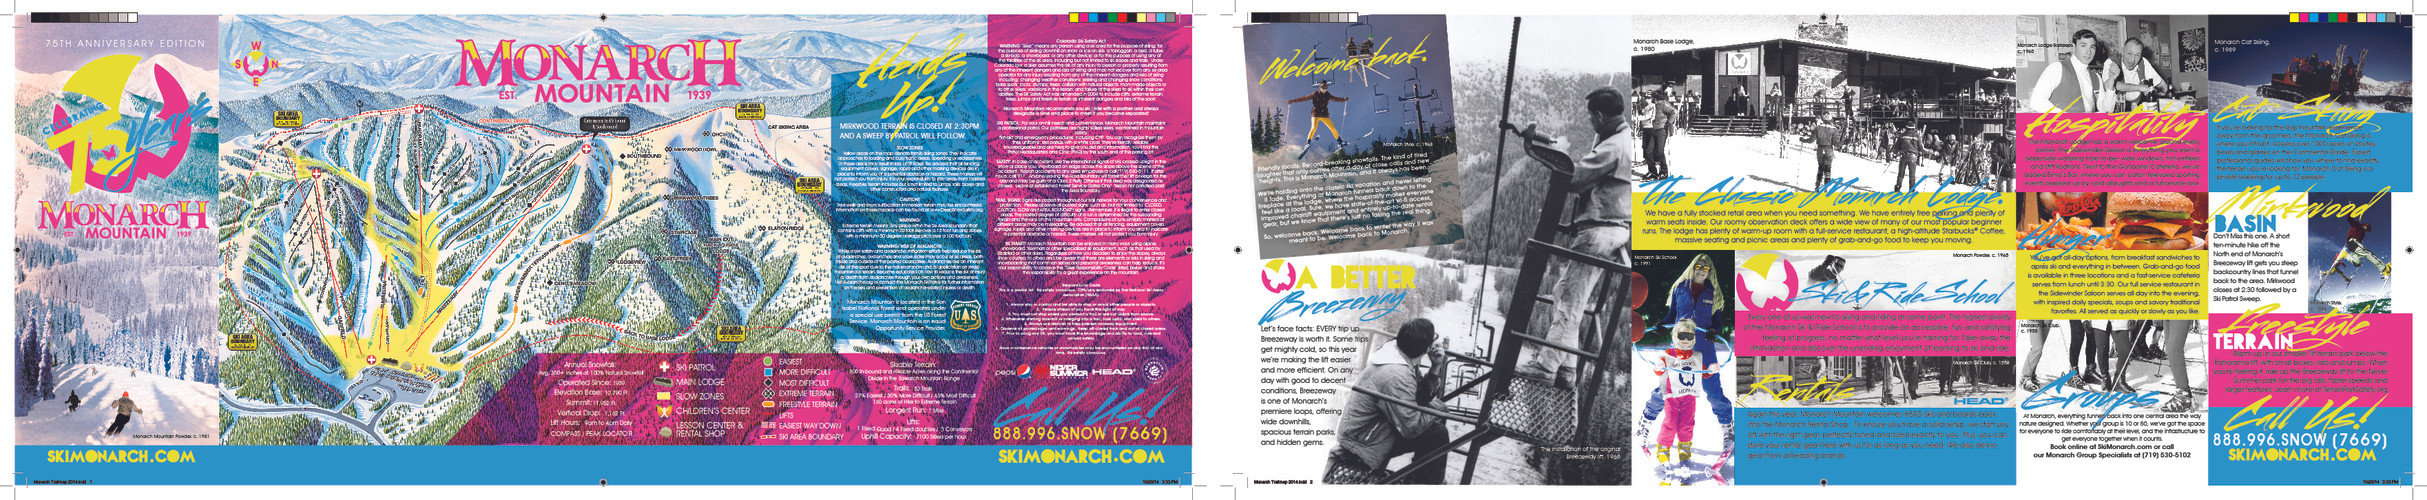 Monarch Mountain 75th Anniversary Trail Map